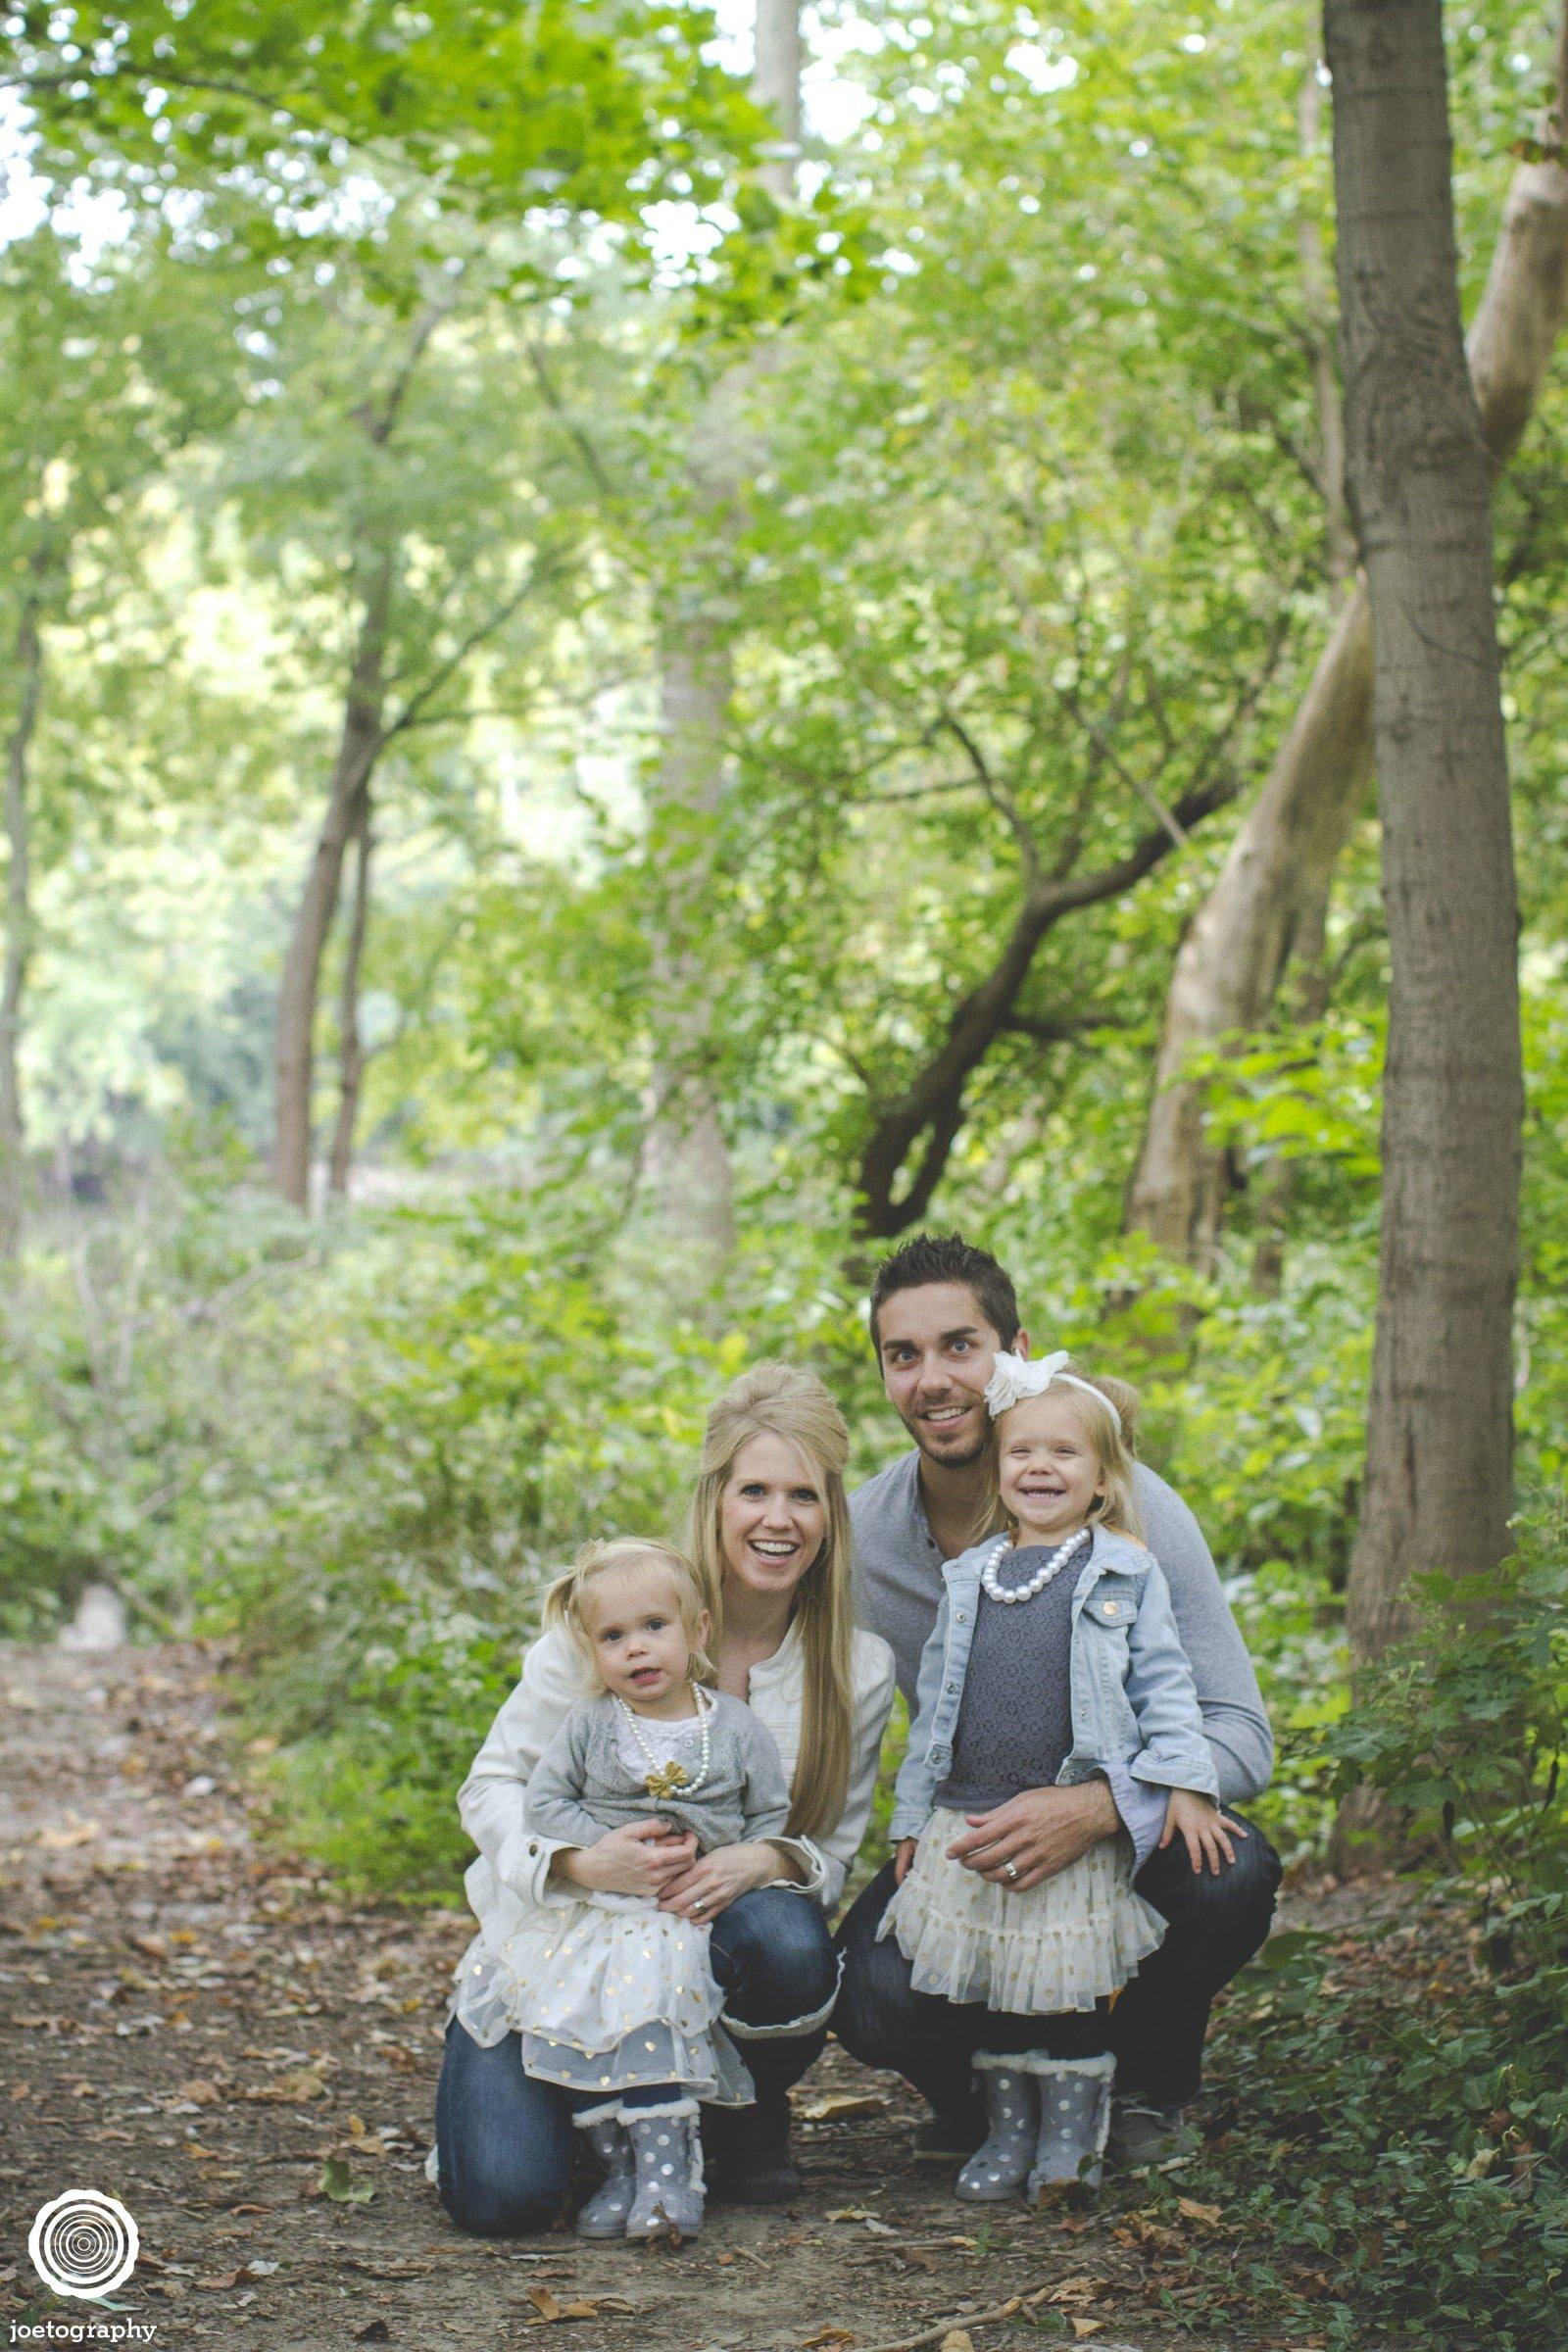 family-photographs-indianapolis-mini-session-harvey-family-59